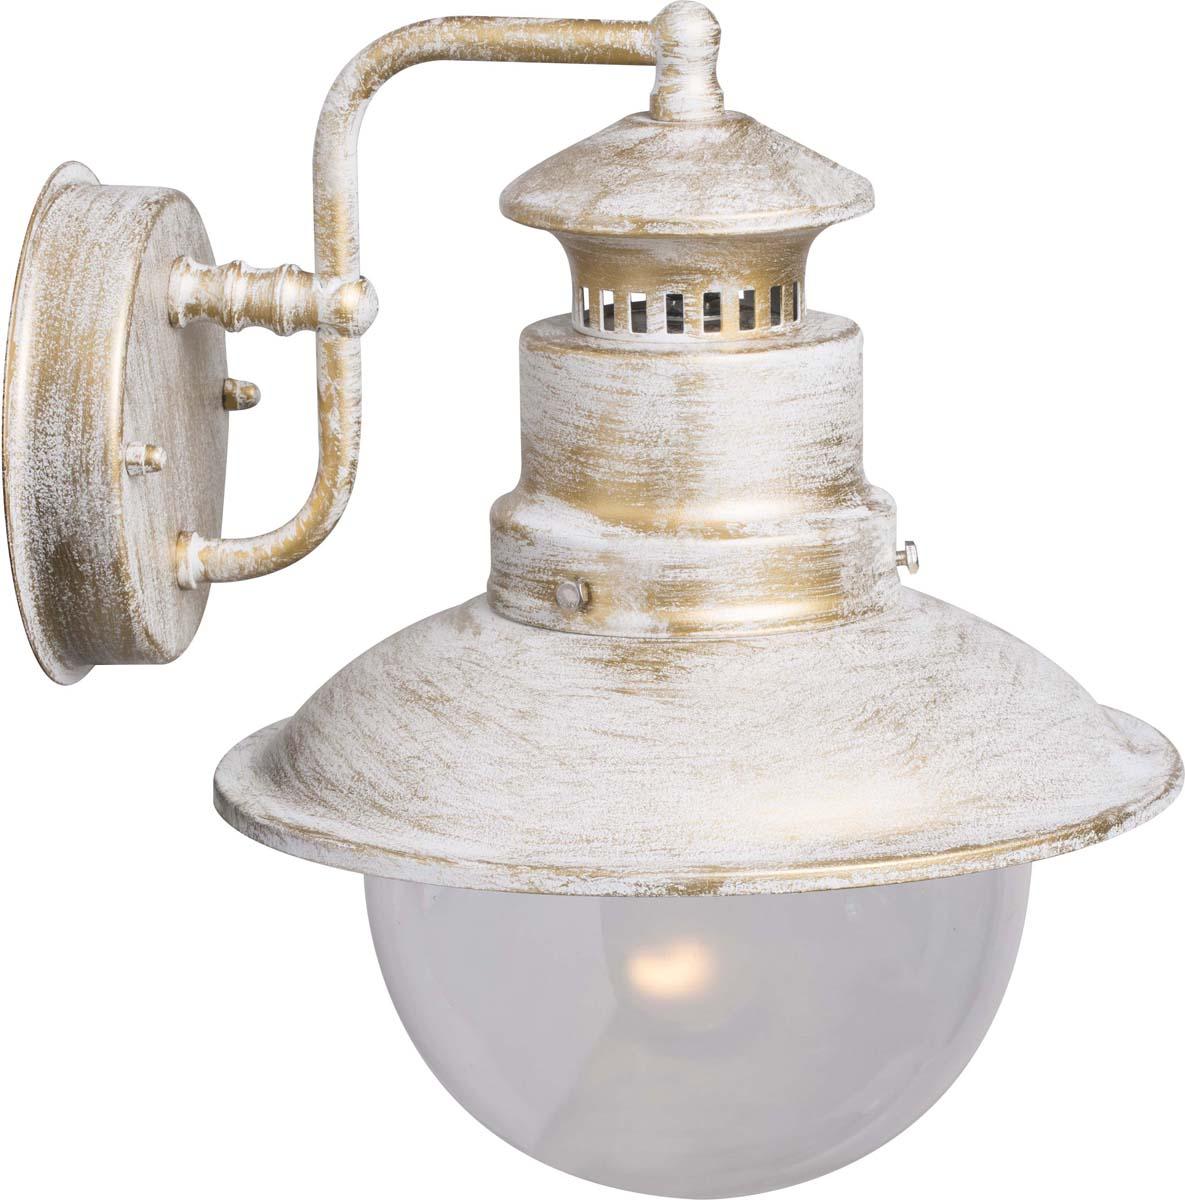 Светильник уличный Arte Lamp Amsterdam, цвет: белый, золотой, 1 х E27, 60 W. A1523AL-1WG